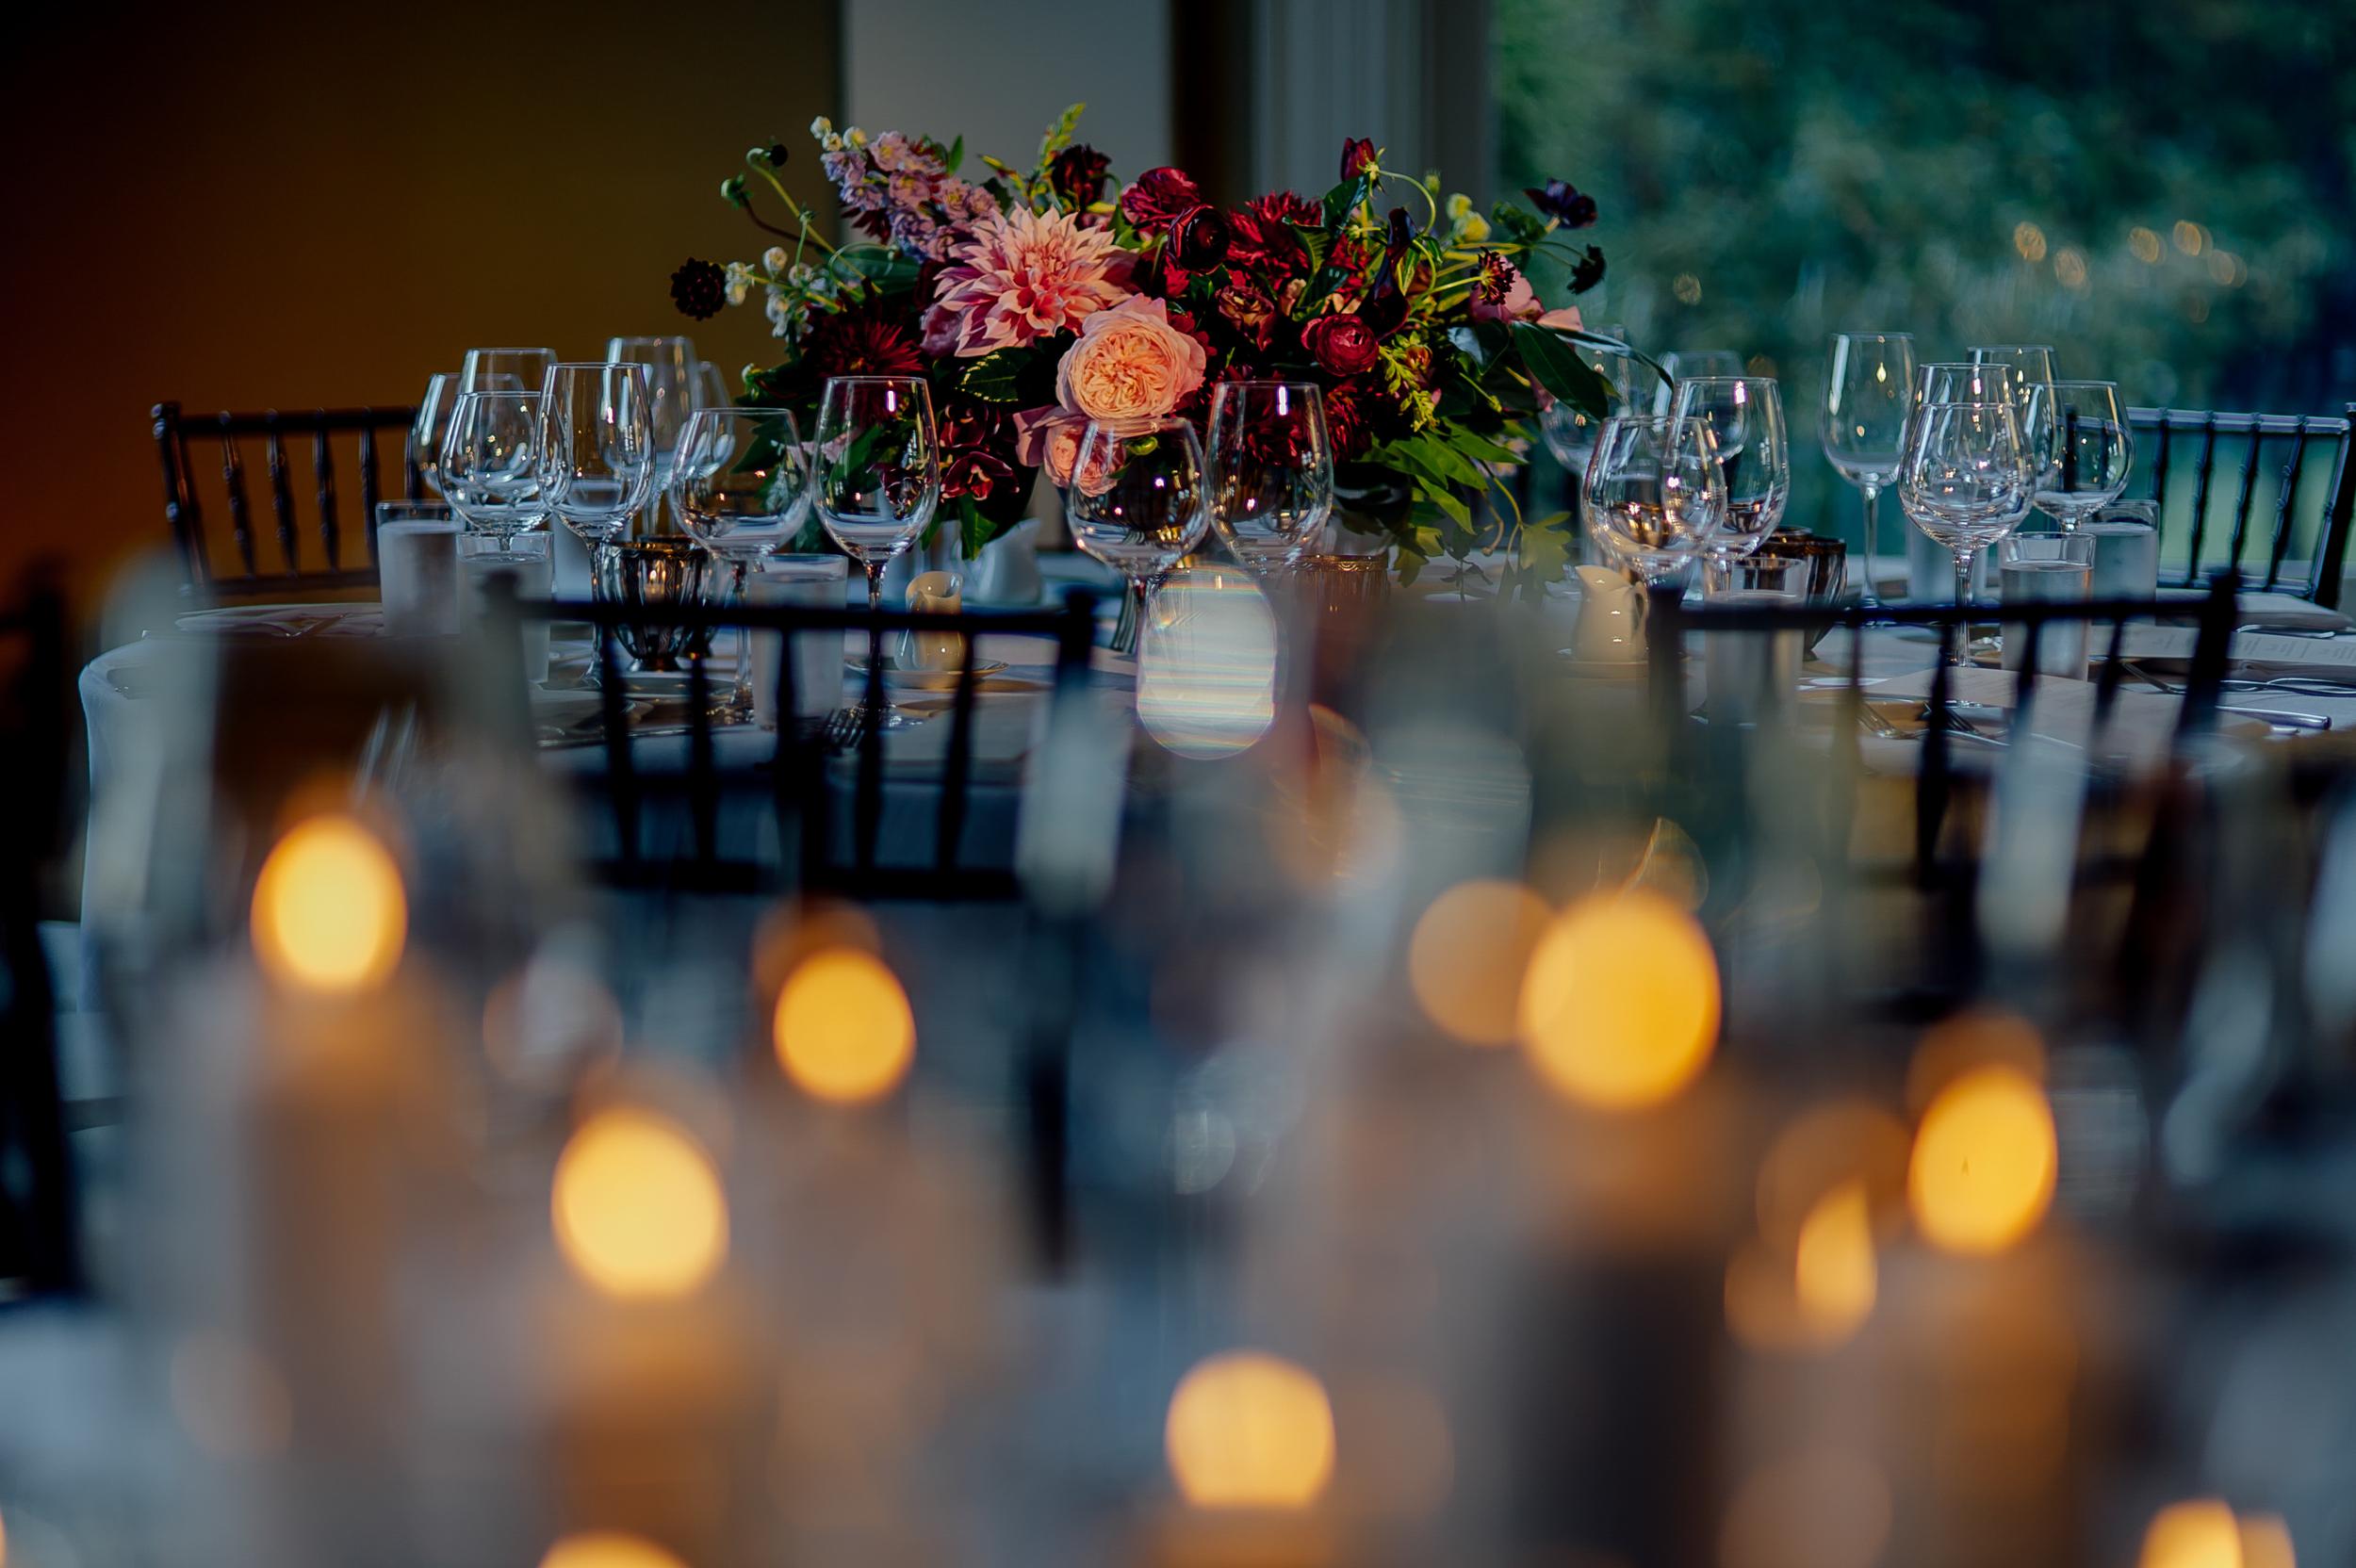 Tara Consolati is the best wedding planner in the Berkshires